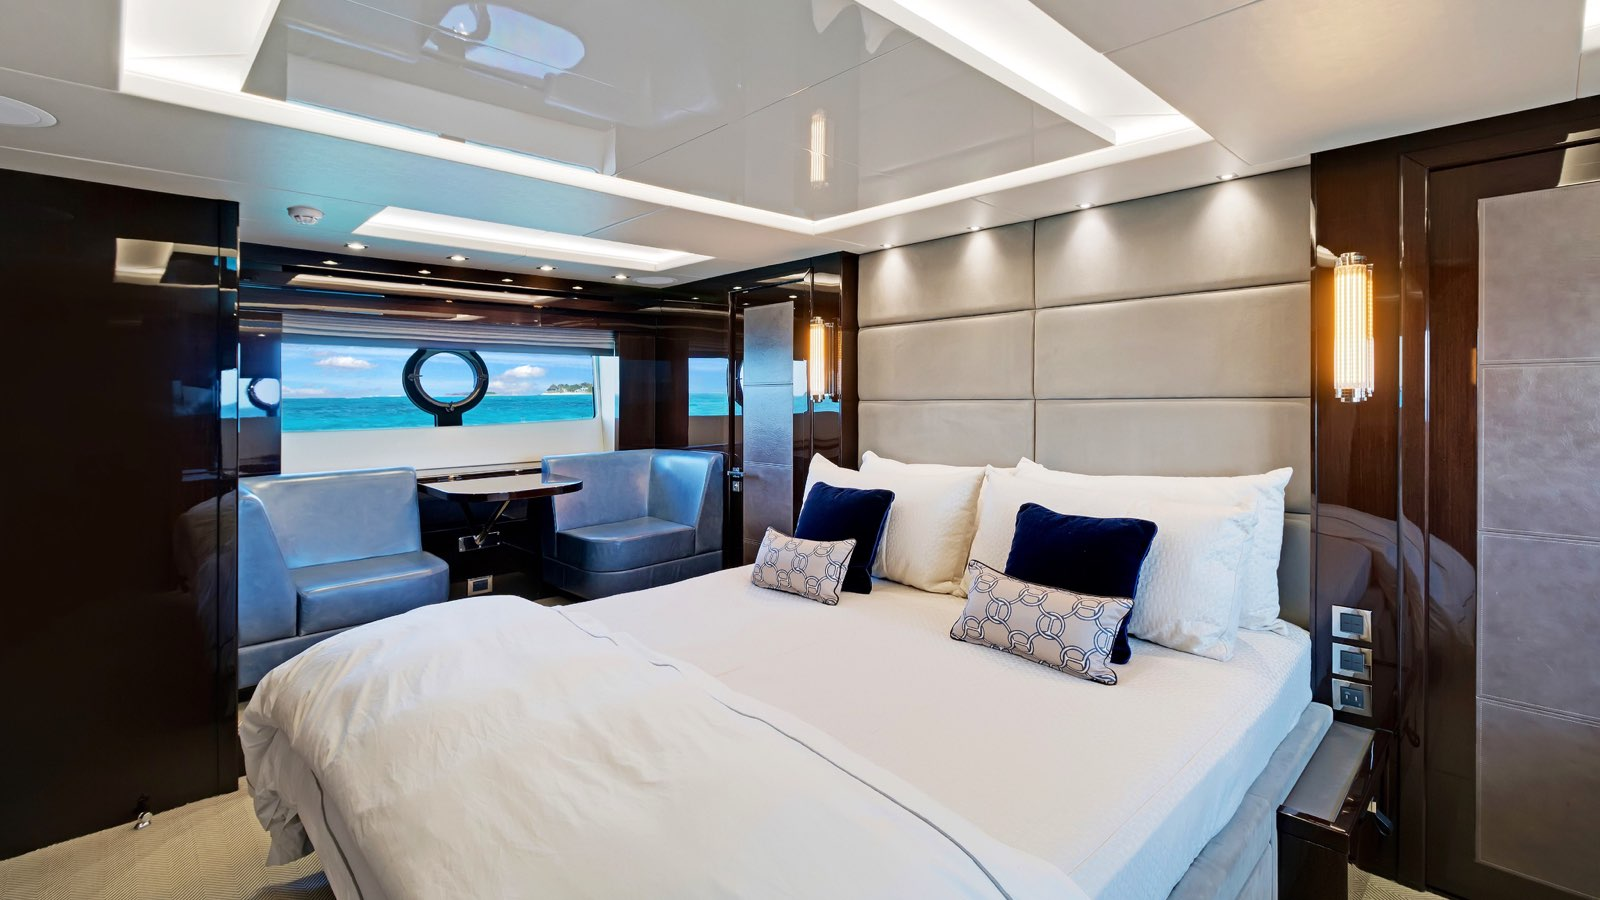 Enterprise_charter_yacht_iyc_interior_master_3.jpeg